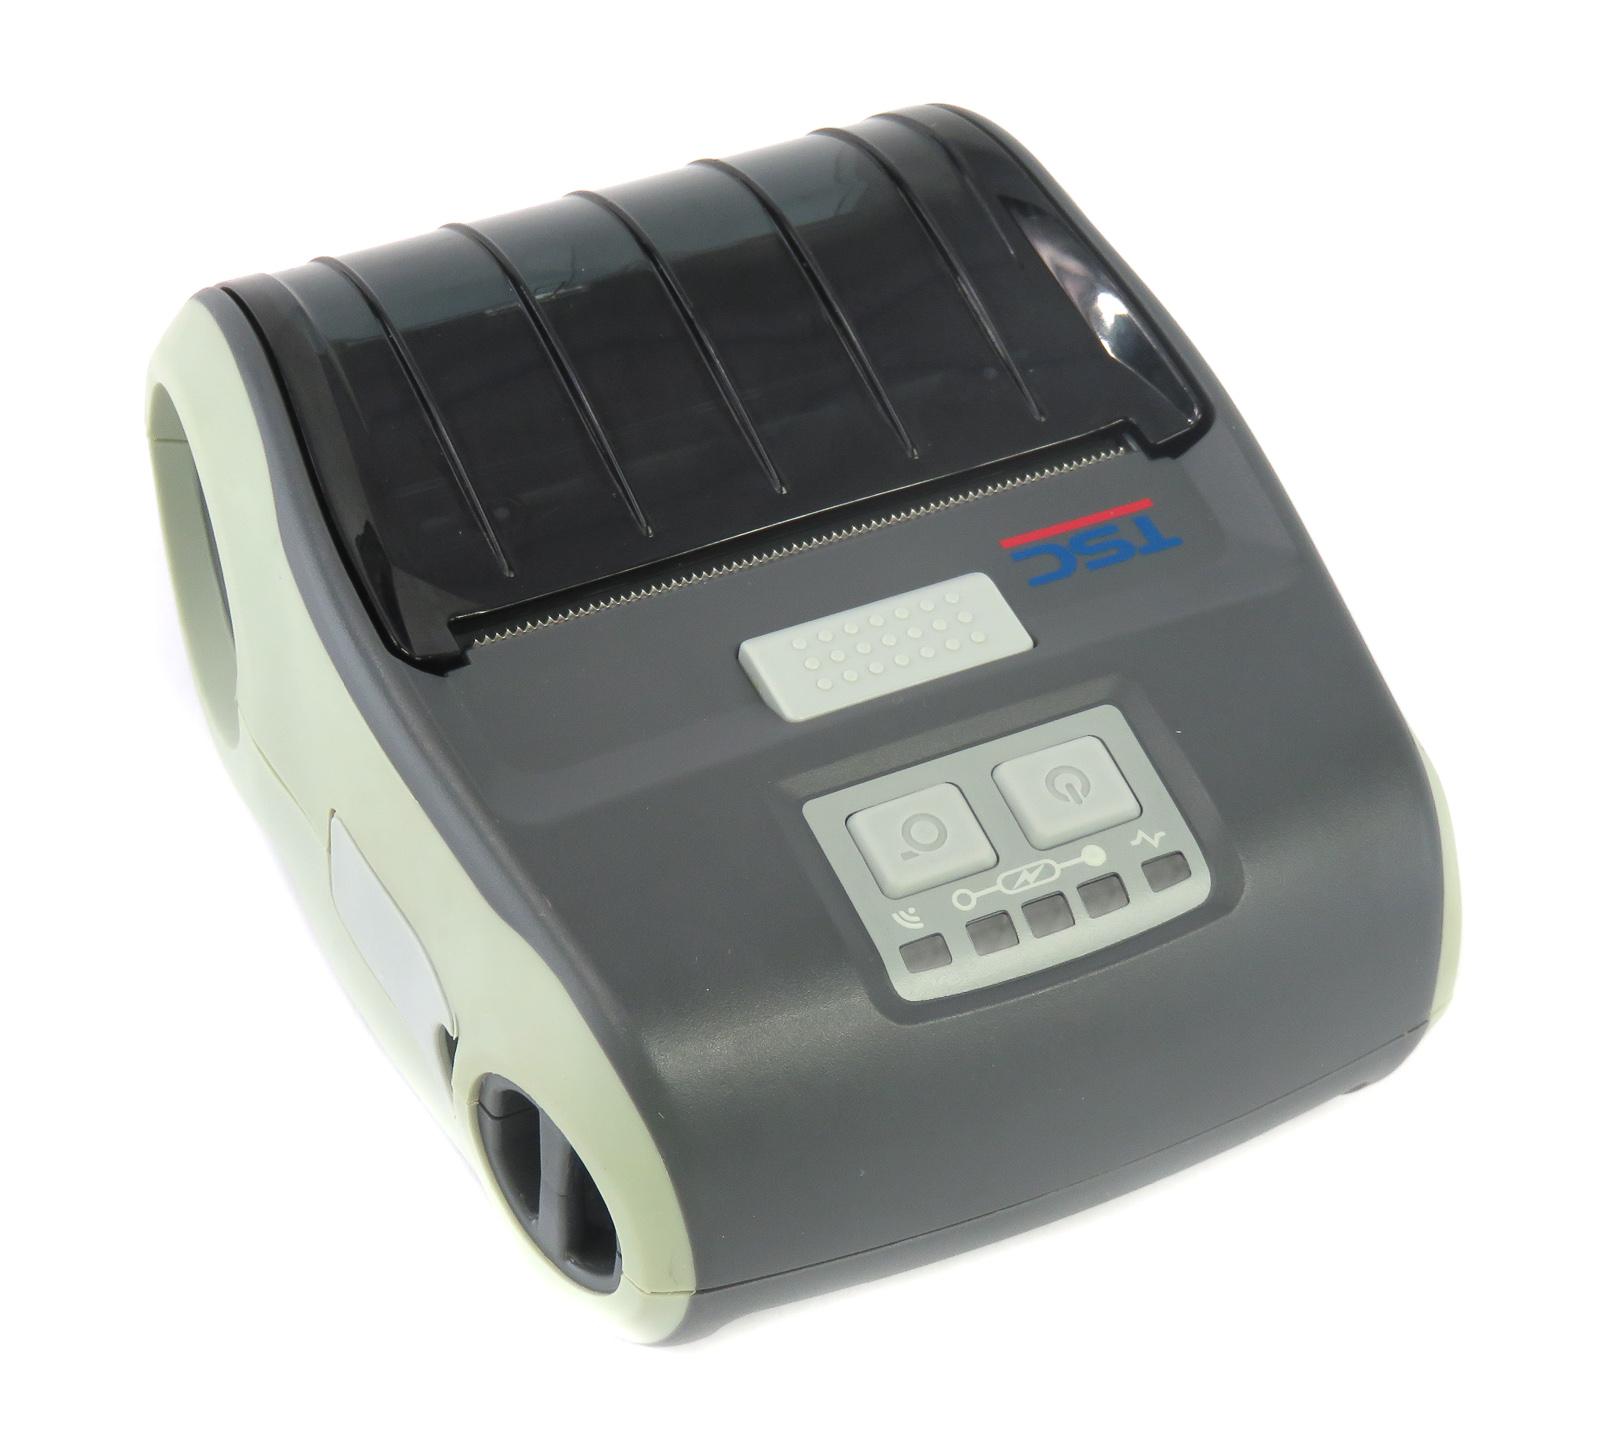 TSC Alpha-3RB Bluetooth Mobile Thermal Receipt Label Printer *Read Description*